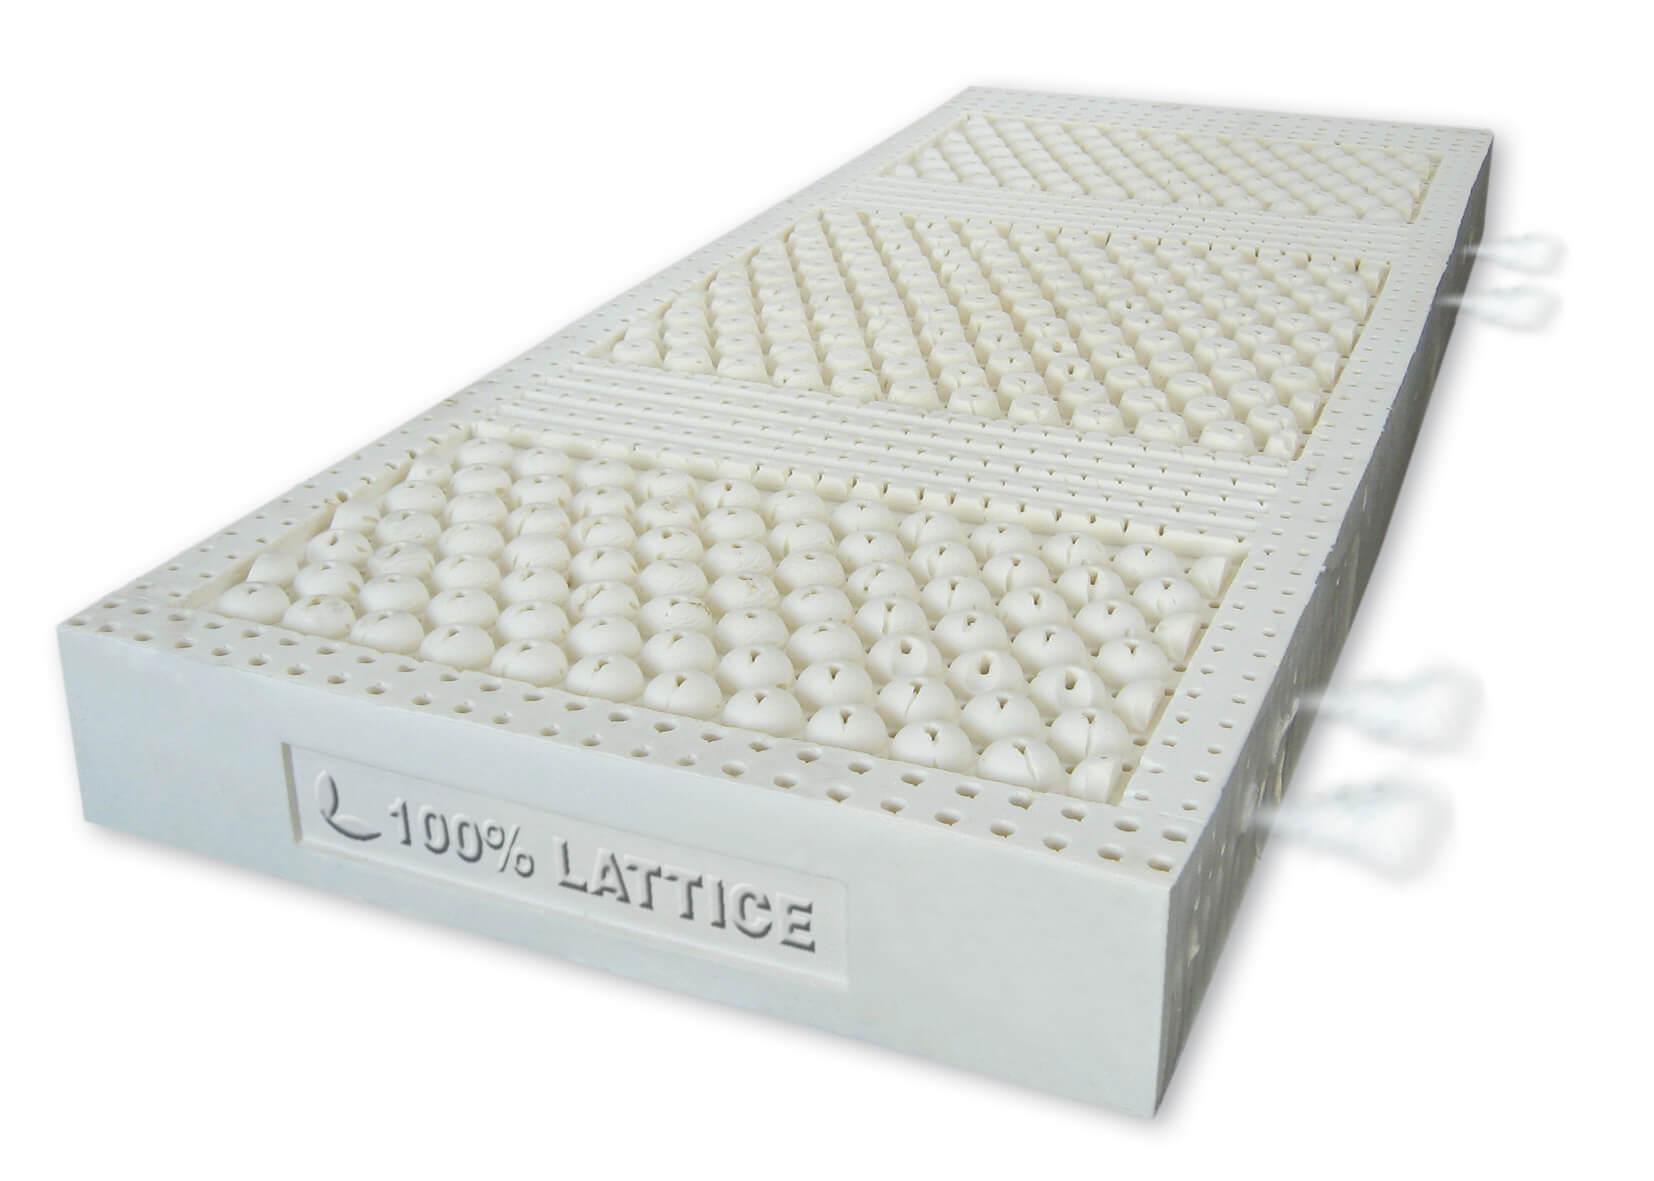 Mattresses mpm materie prime materassi - Materassi ikea lattice ...